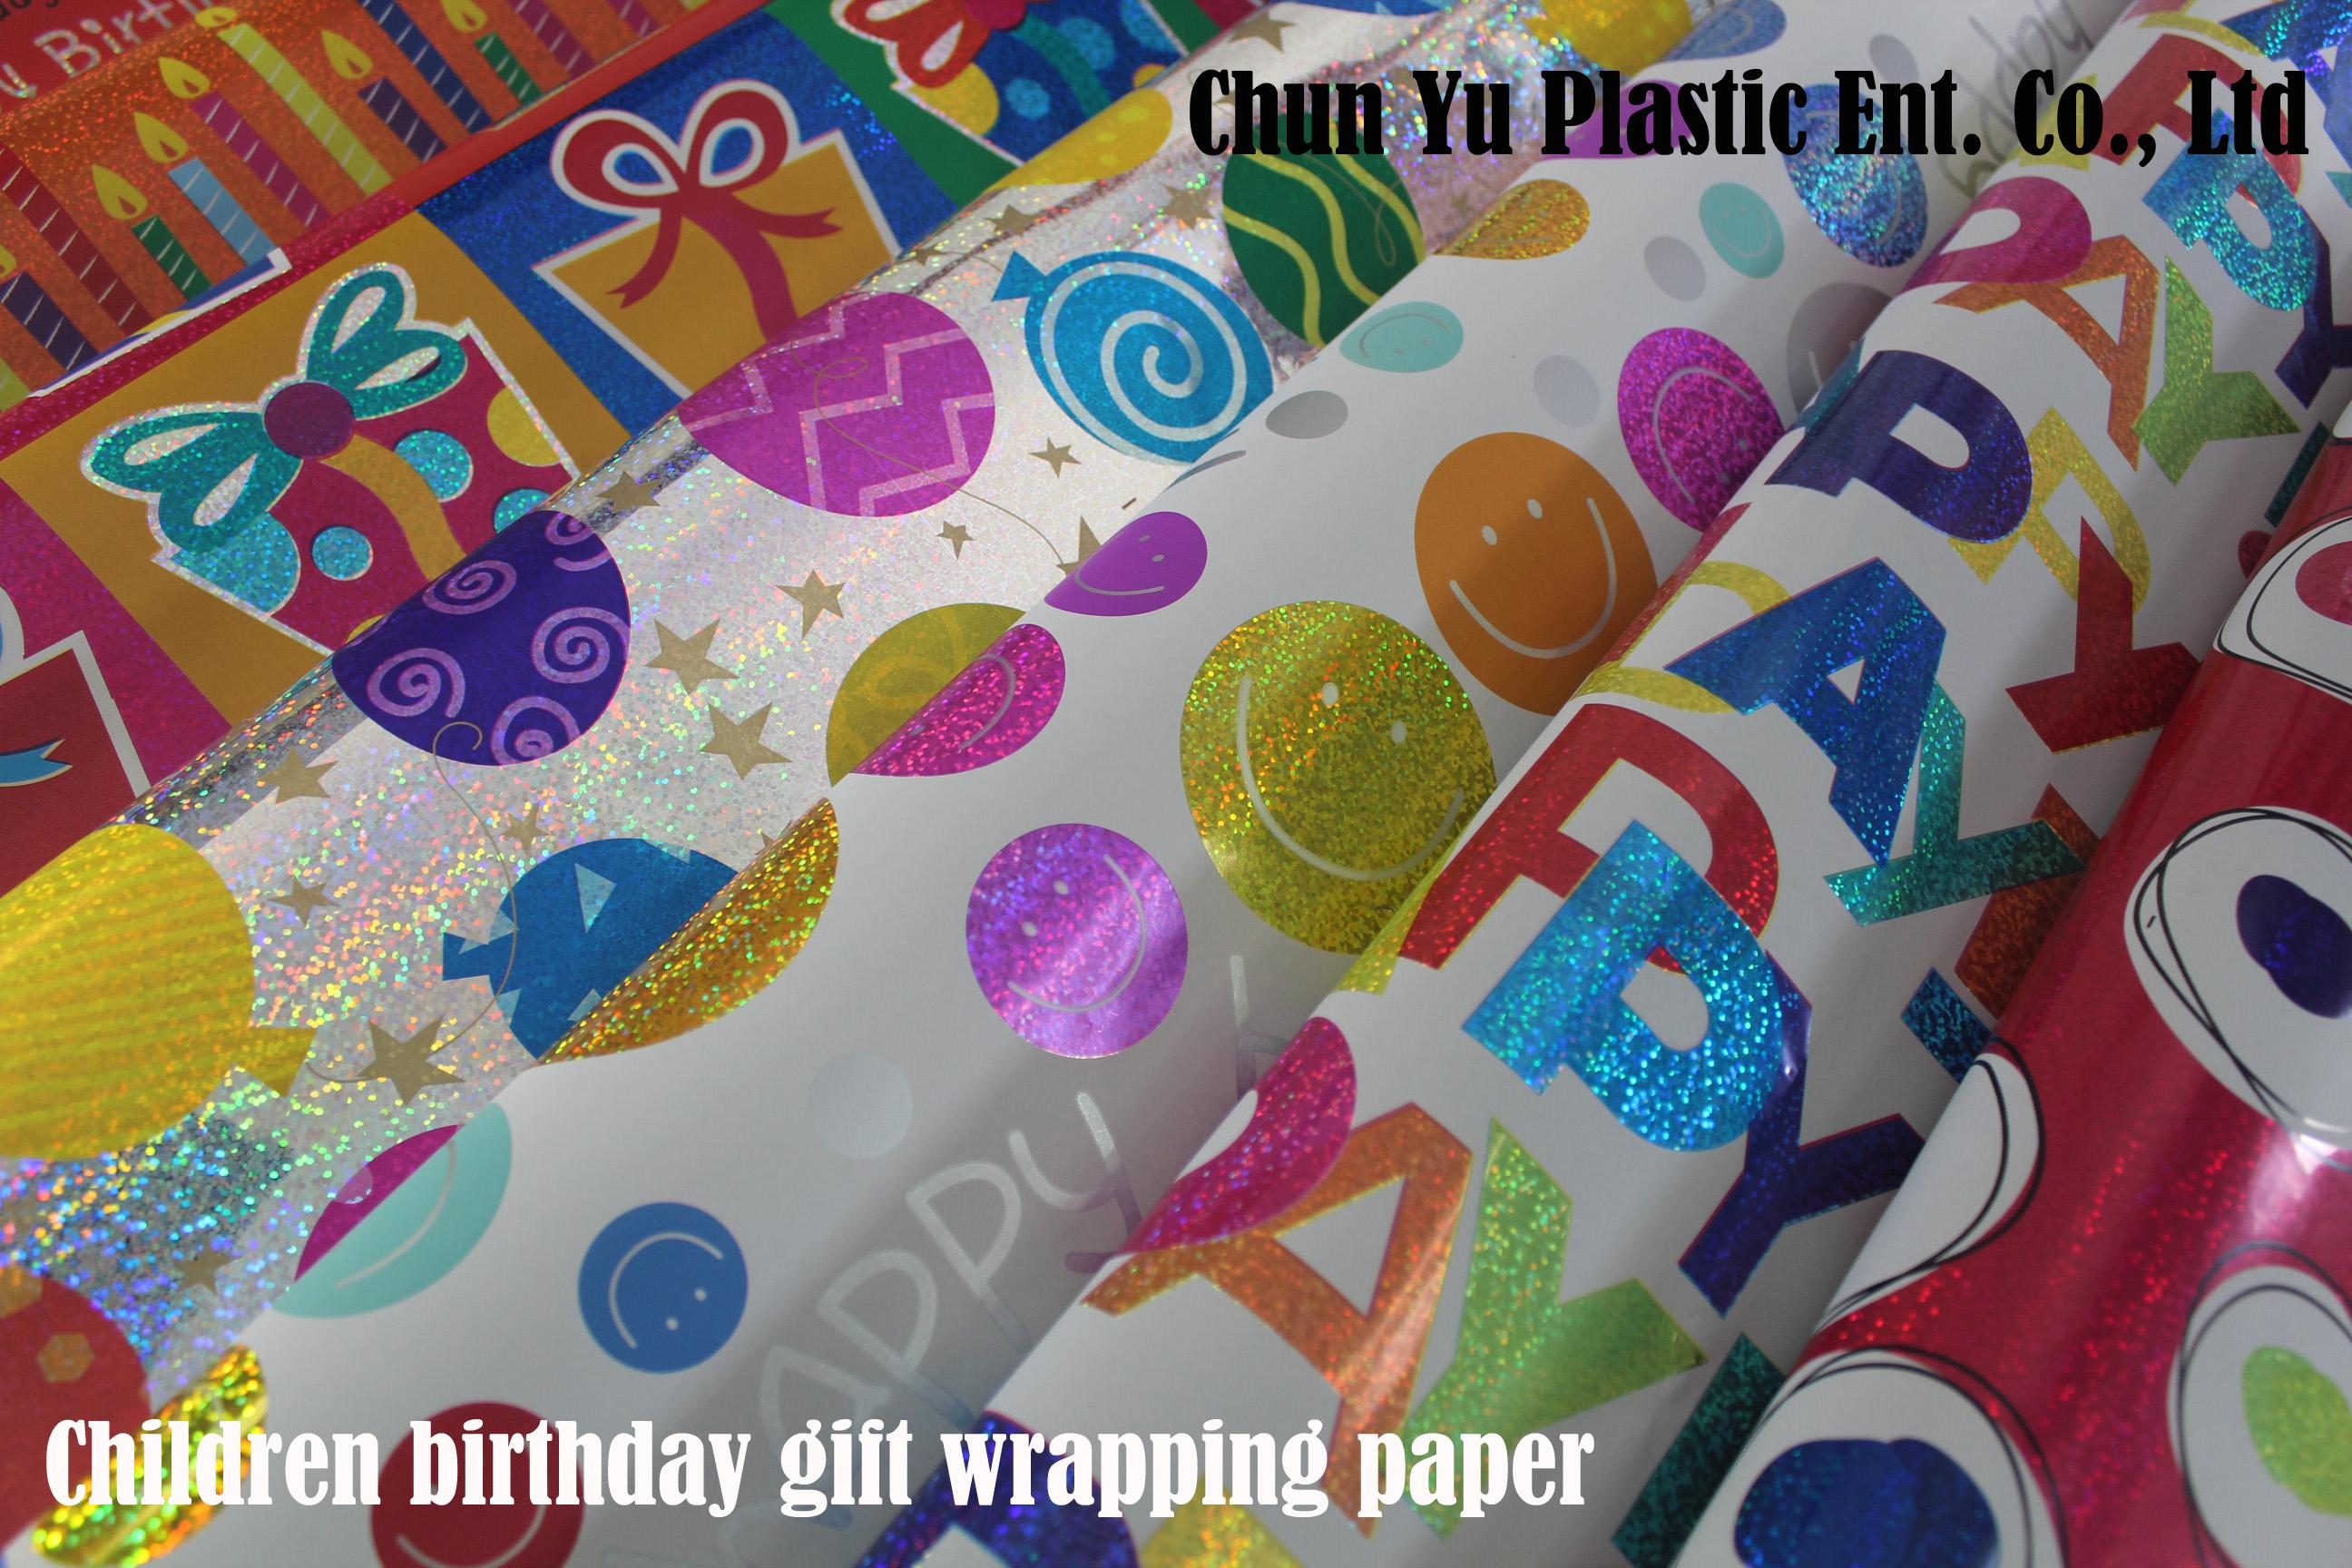 Kertas kado dicetak dengan desain anak-anak untuk pesta ulang tahun dan perayaan. Kami memiliki kertas kado ulang tahun untuk anak perempuan dan laki-laki.